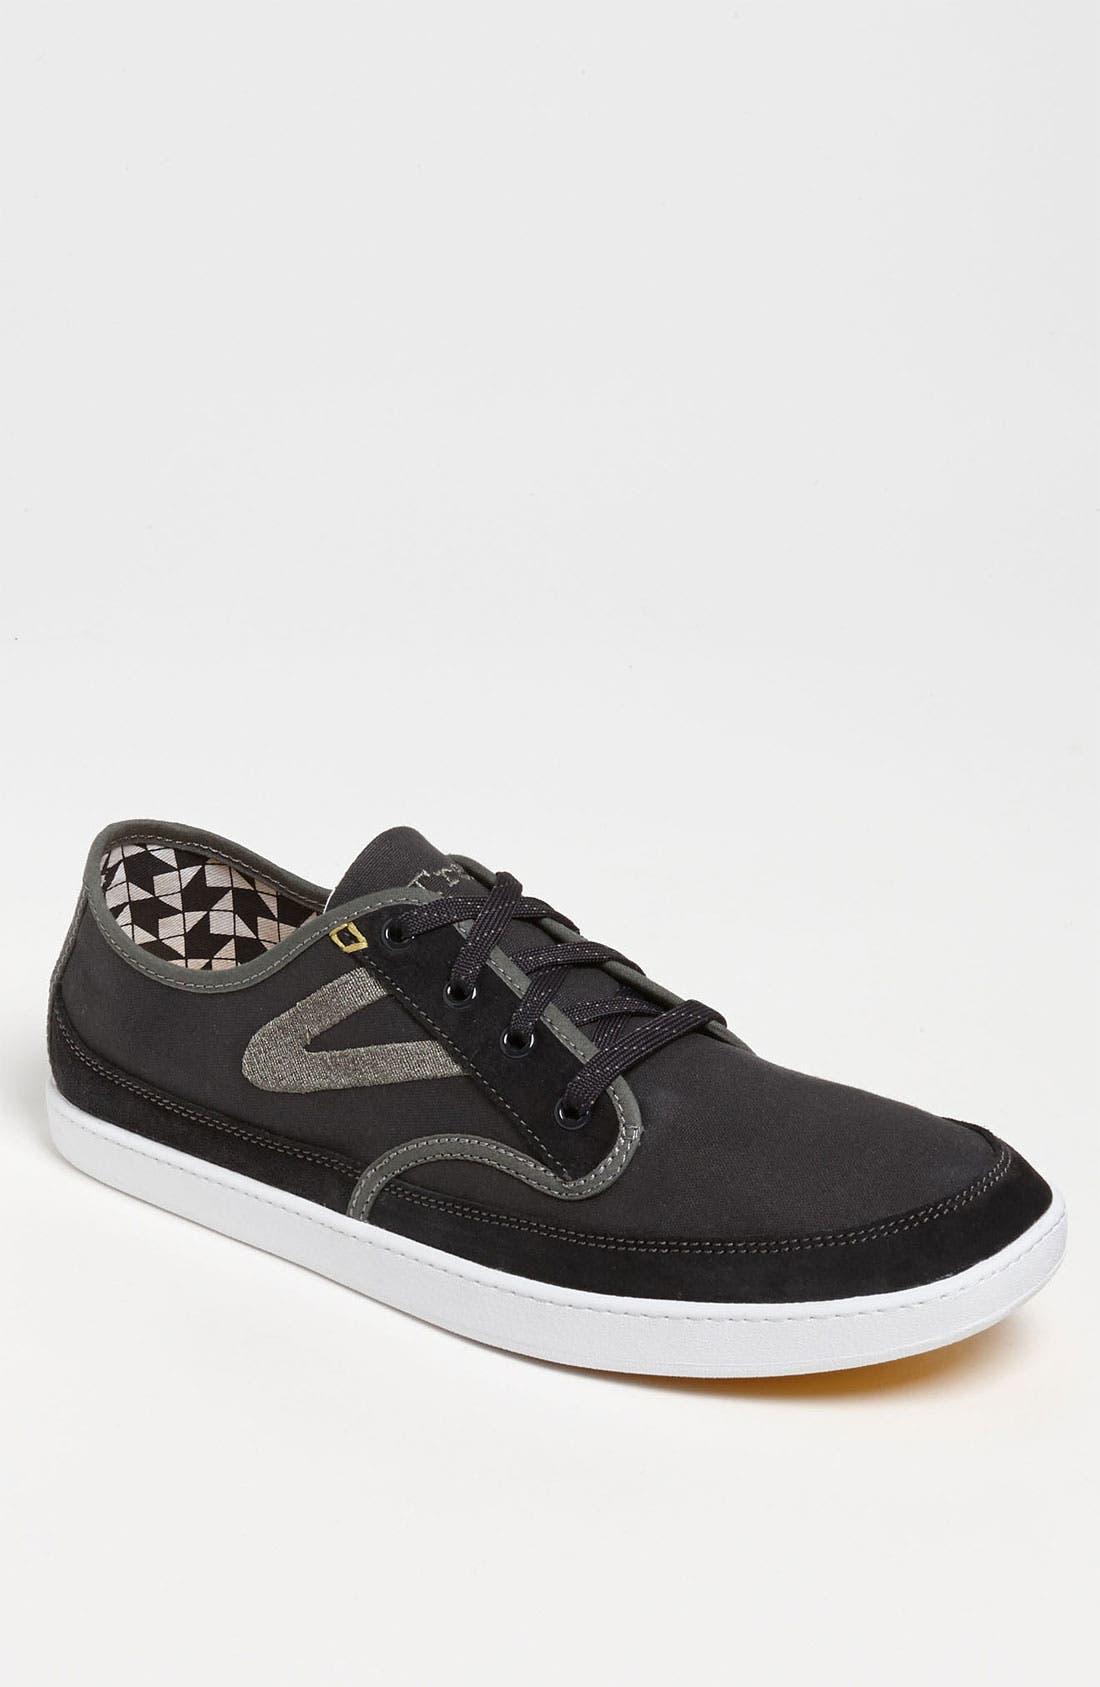 Main Image - Tretorn 'Alkarr' Sneaker